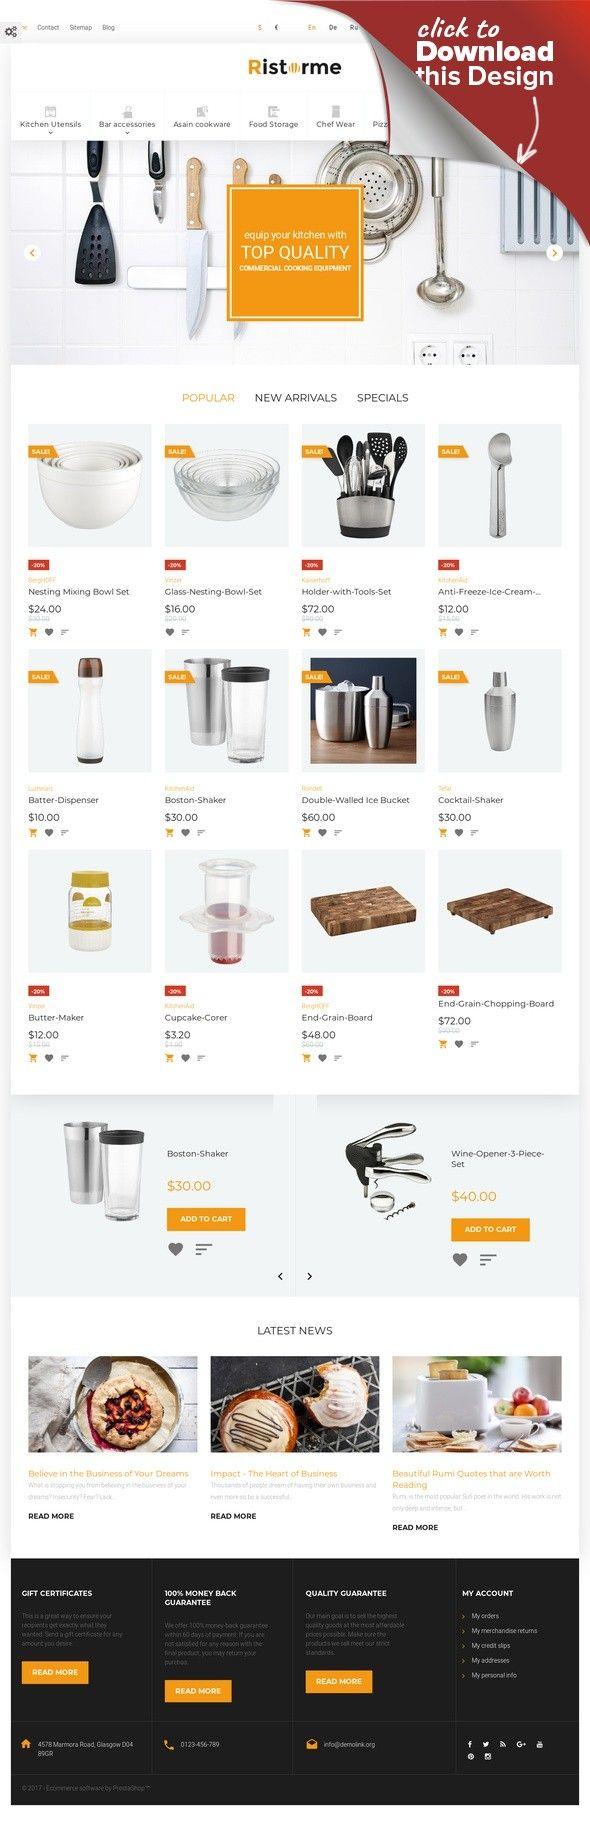 Ristorme - Restaurant Equipment & Houseware PrestaShop Theme | Template